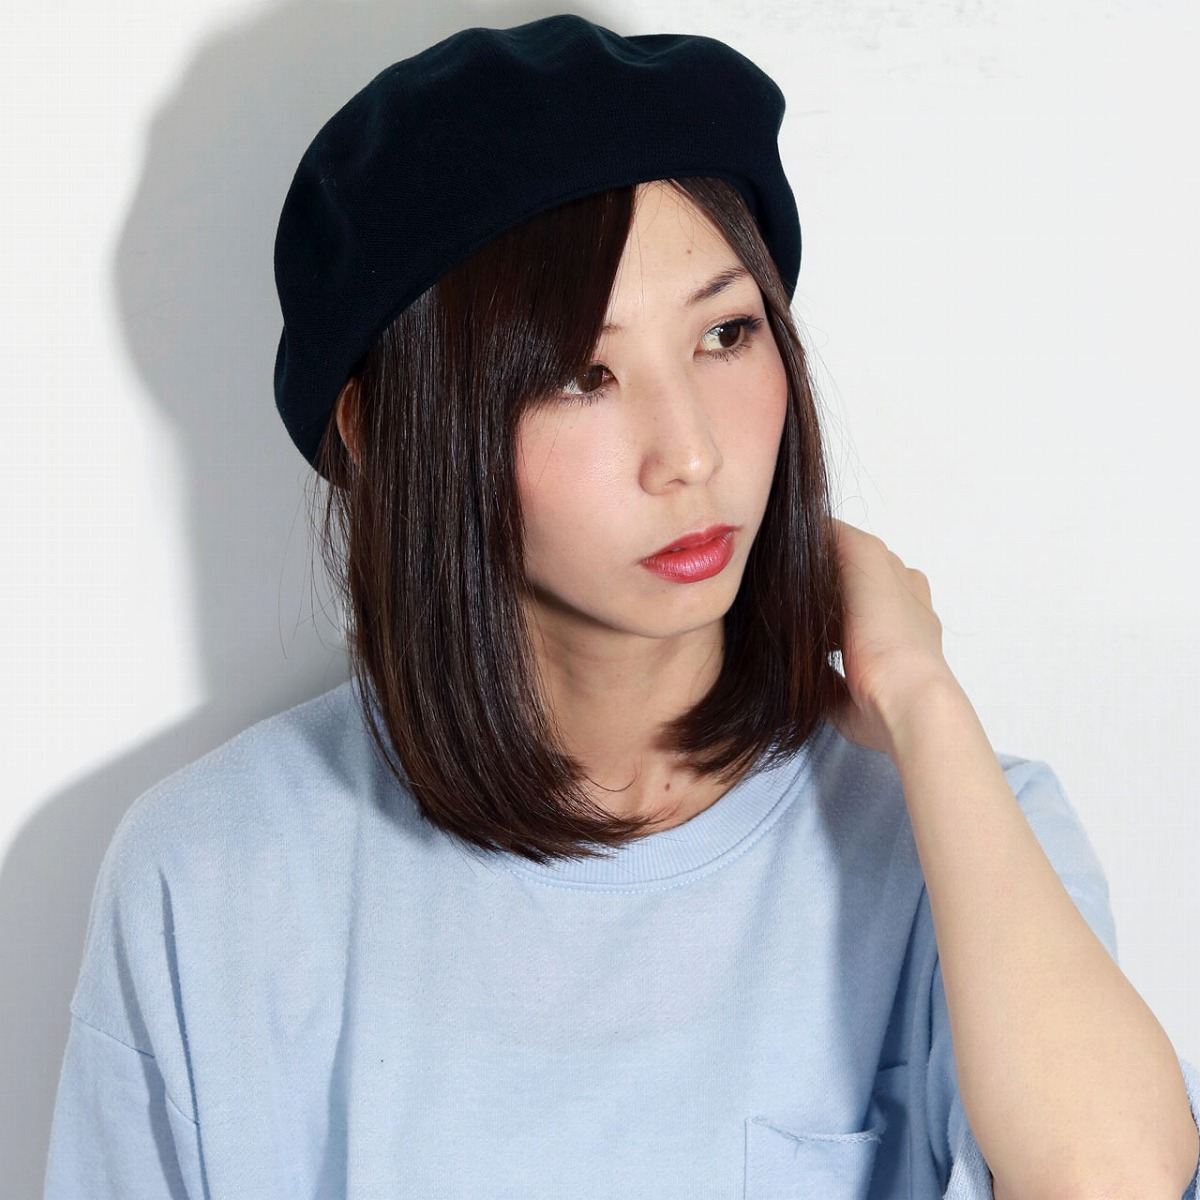 Elehelm hat store ladys beret black beret for the brand jpg 1200x1200  Japanese grandpa with baret b5094fcd8fae